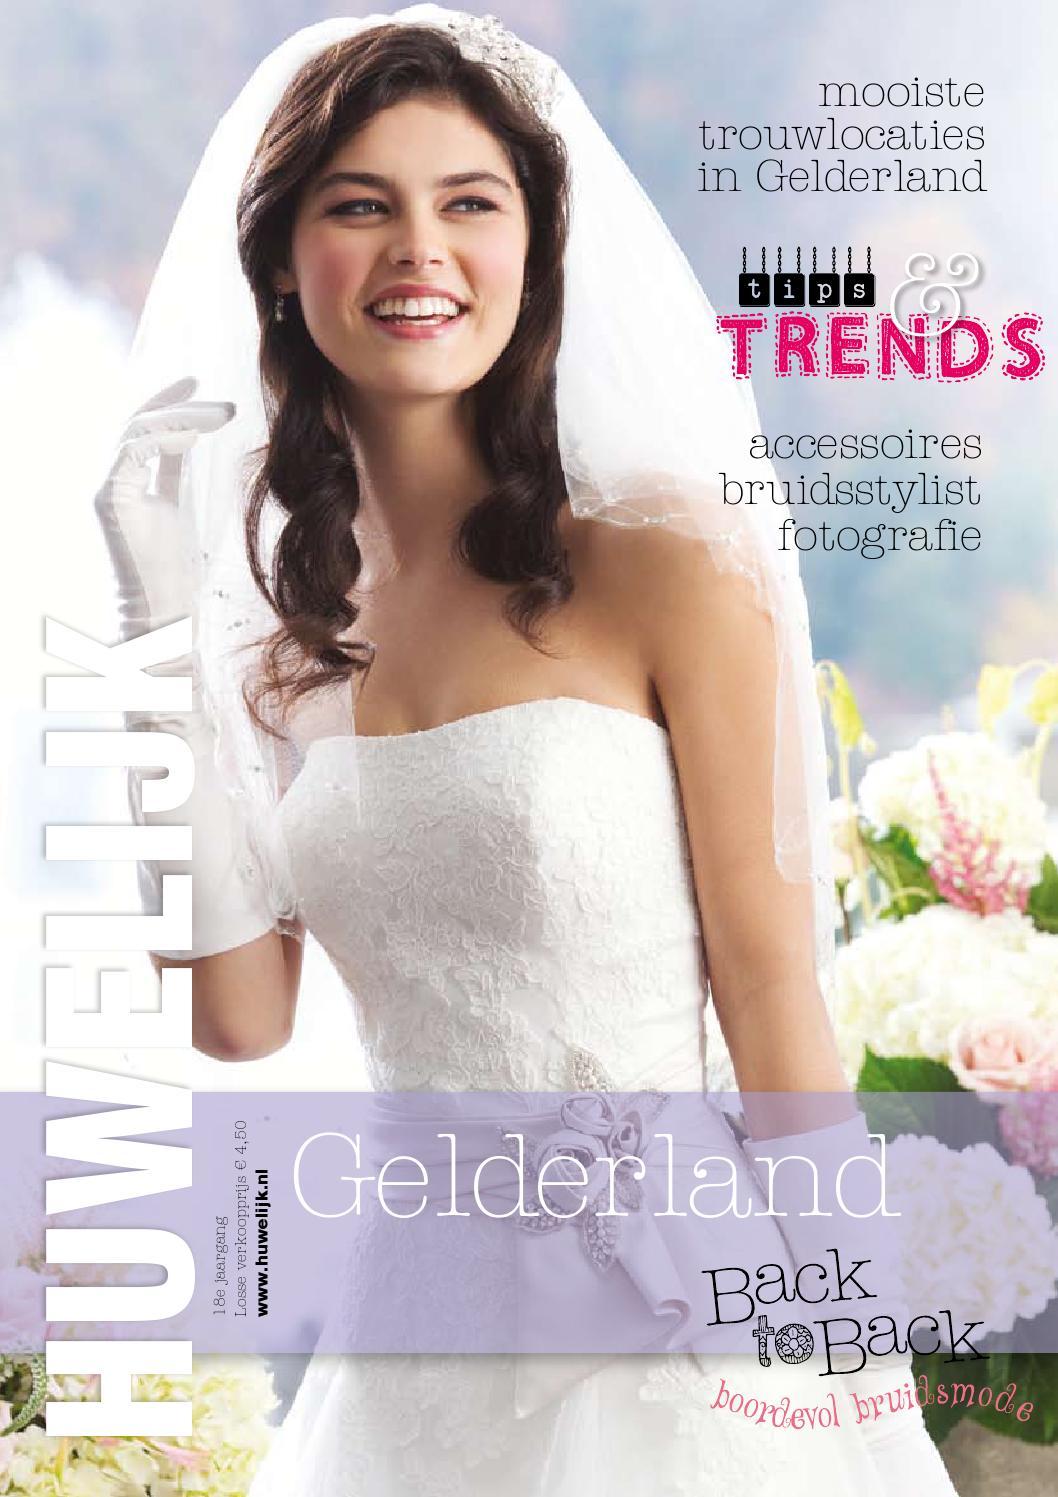 Huwelijk in brabant 2014 by ward media   issuu